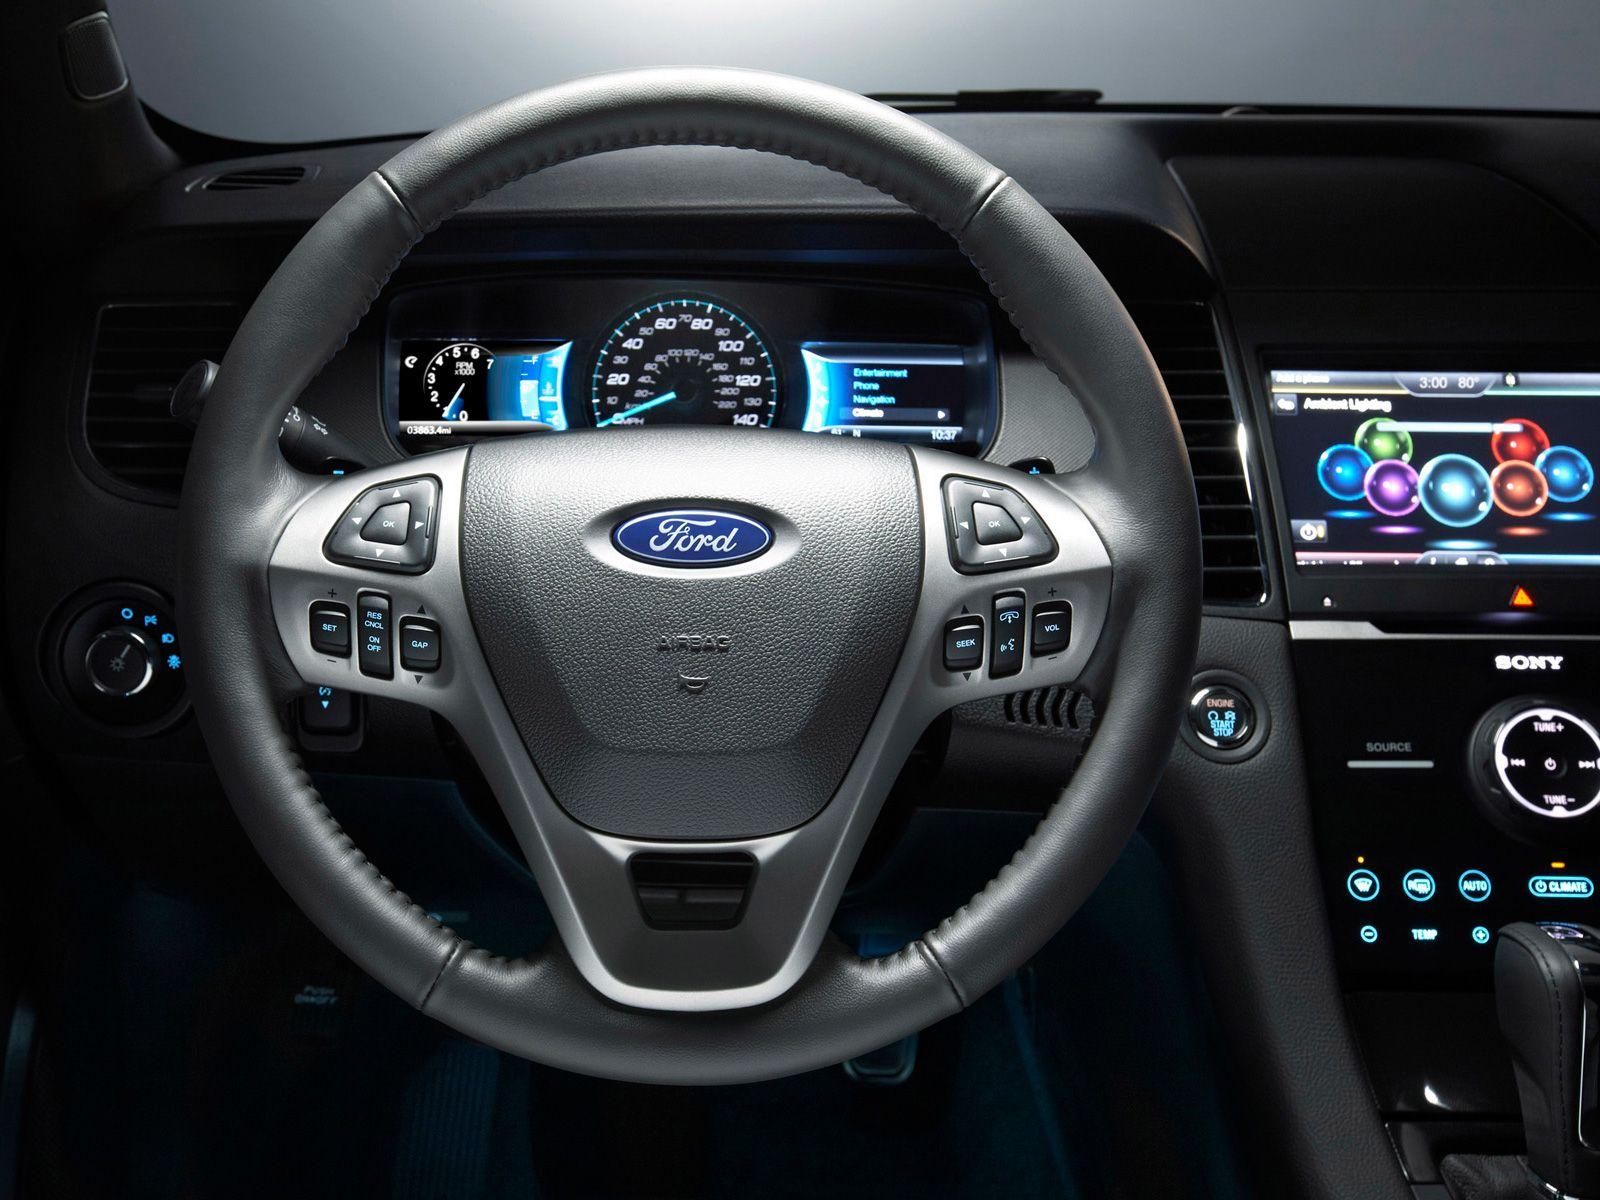 2015 Ford Taurus Sho Dashboard Interior Carbenz Com Ford Taurus Sho Taurus Ford